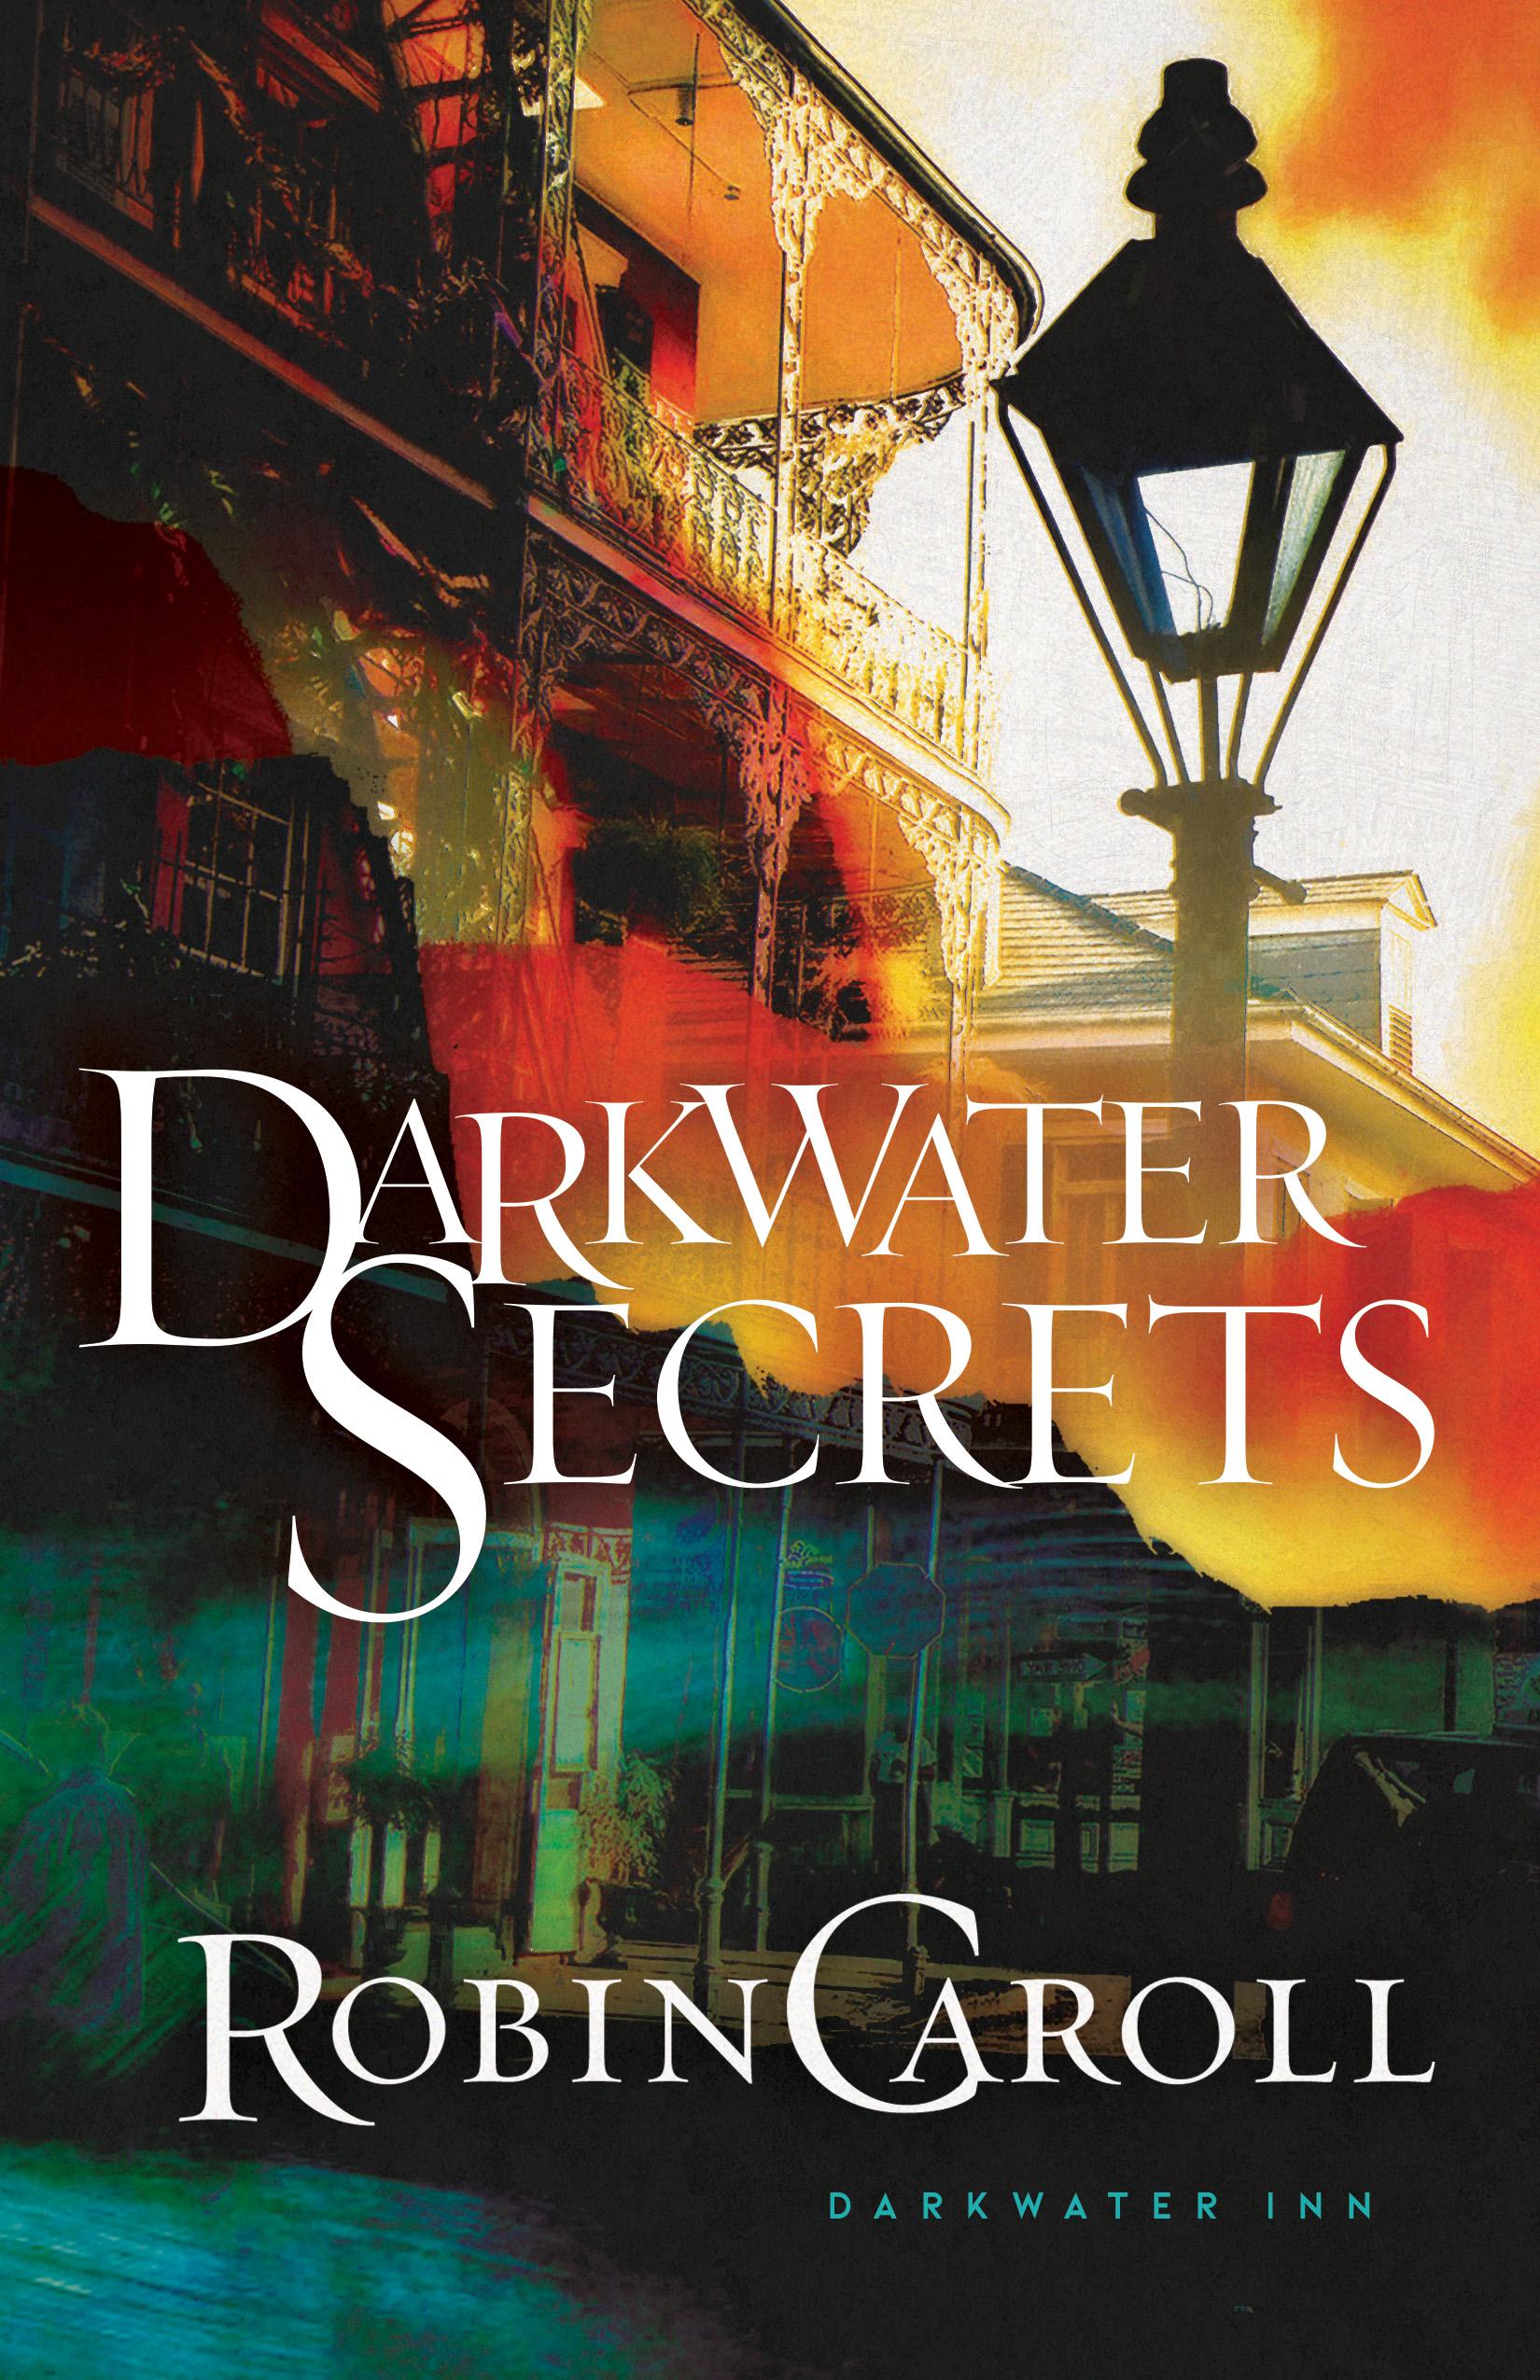 Darkwater Secrets